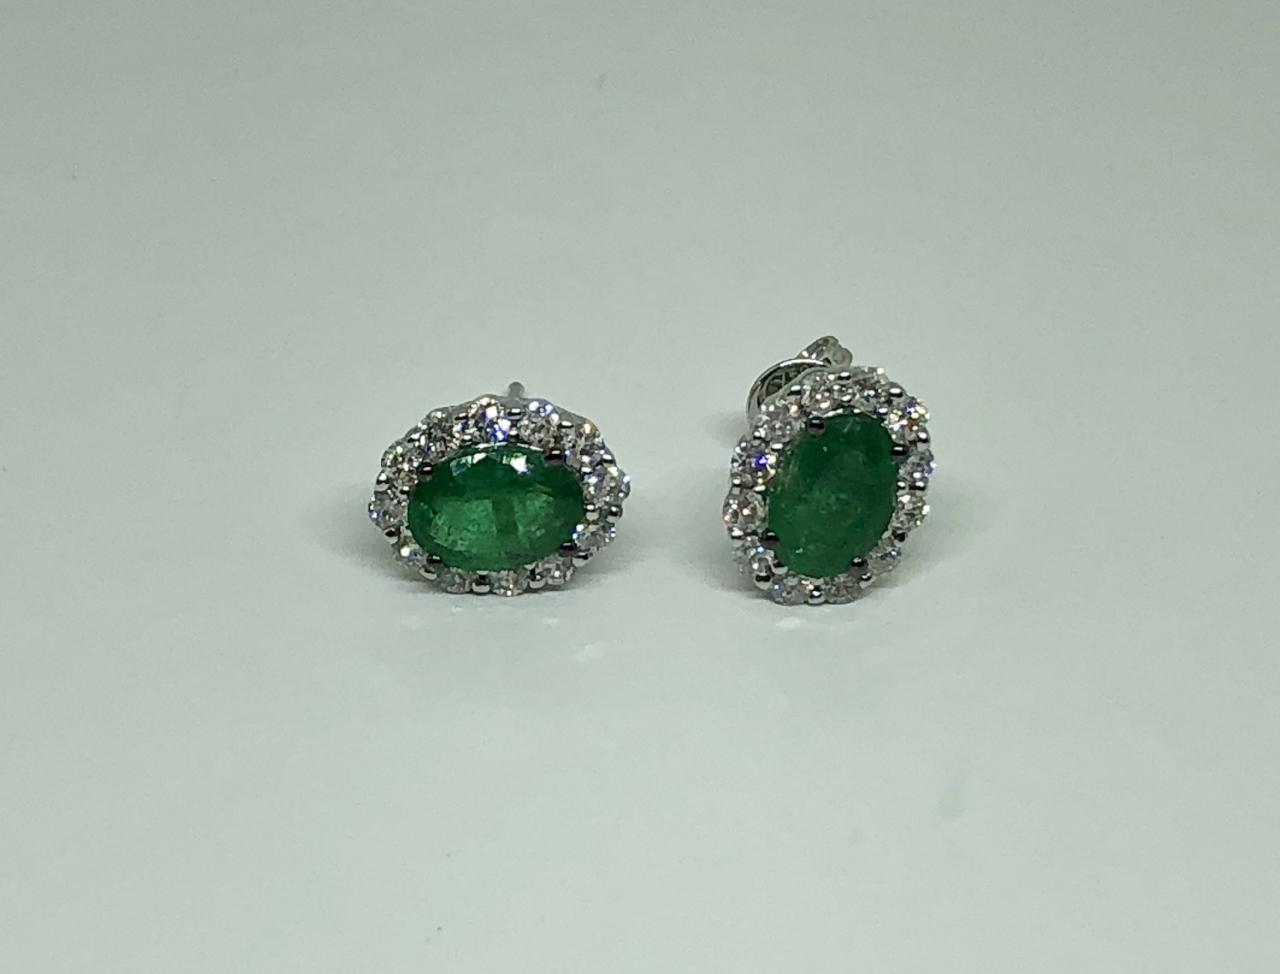 Over 1 Carat Emerald Diamond Earrings